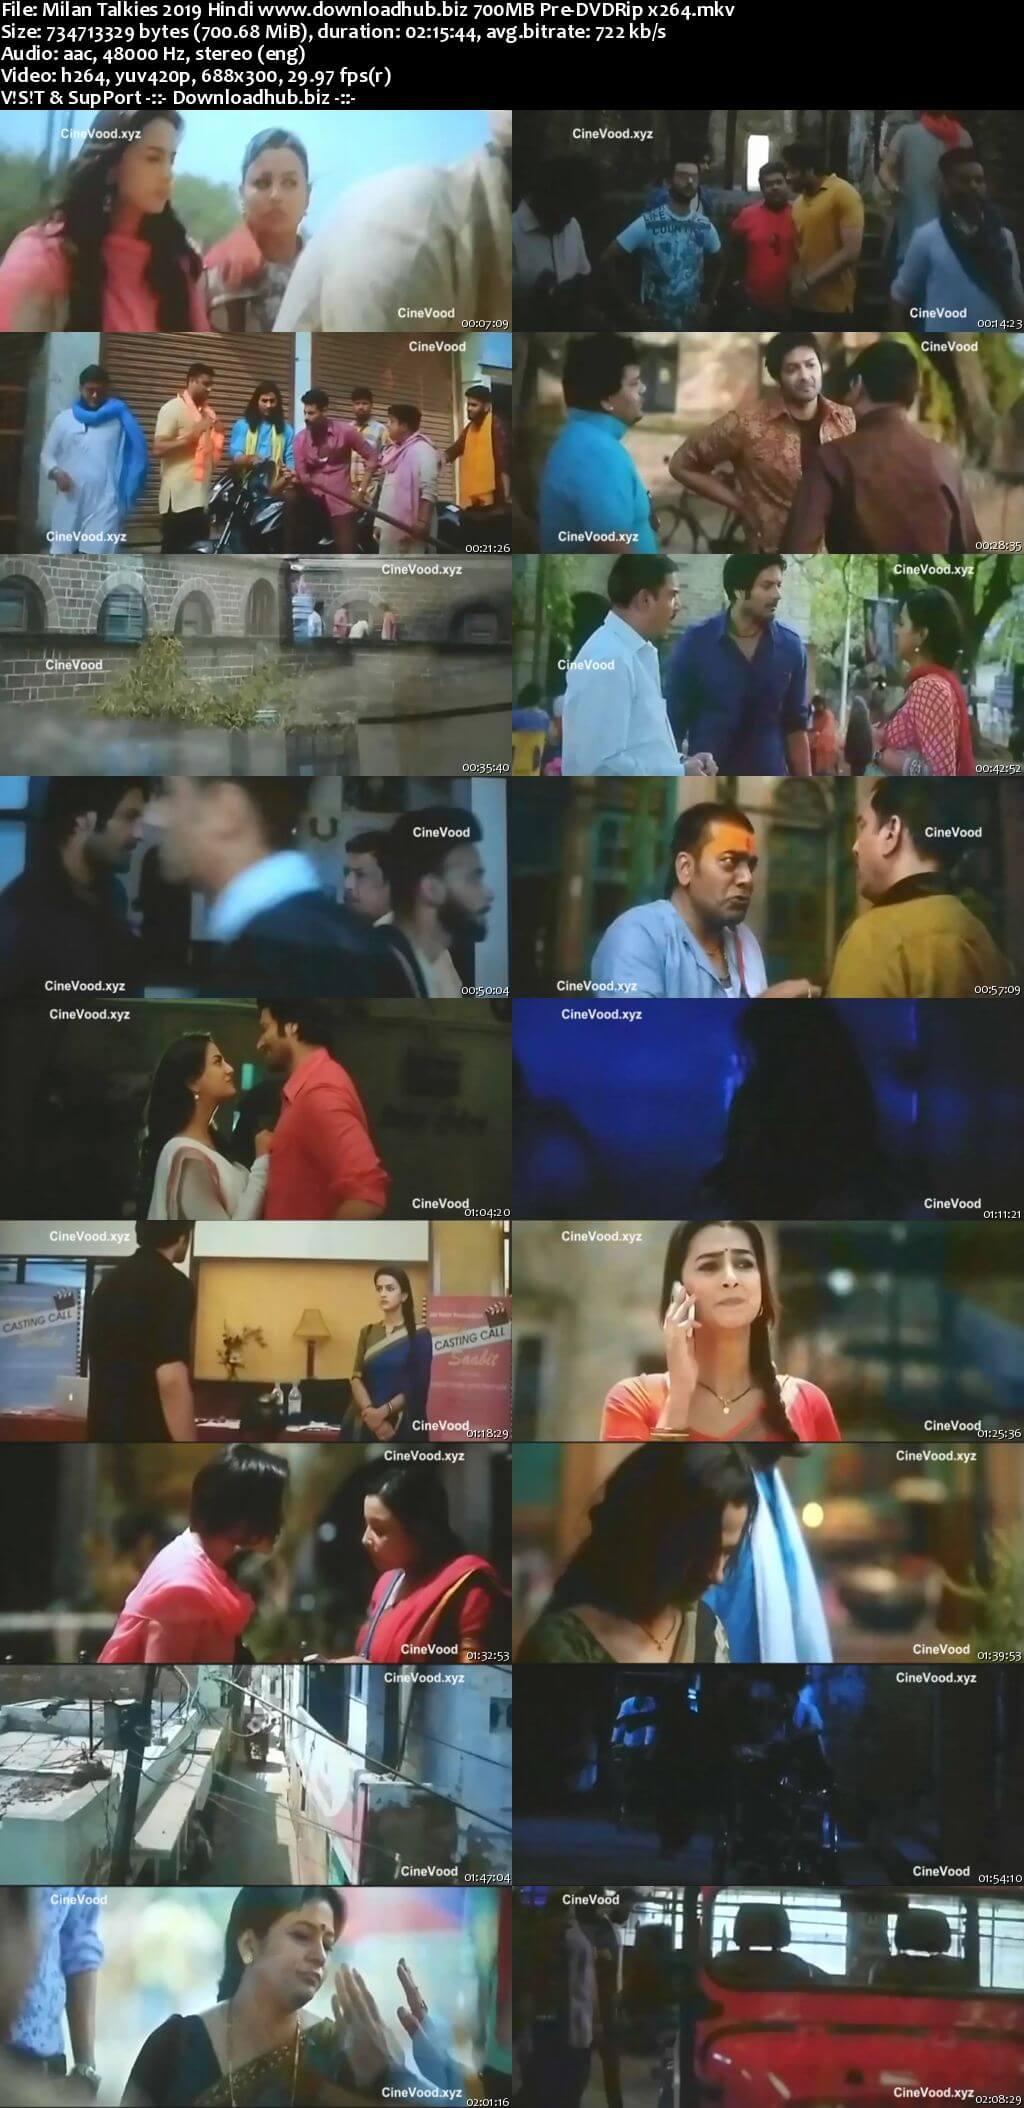 Milan Talkies 2019 Hindi 700MB Pre-DVDRip x264